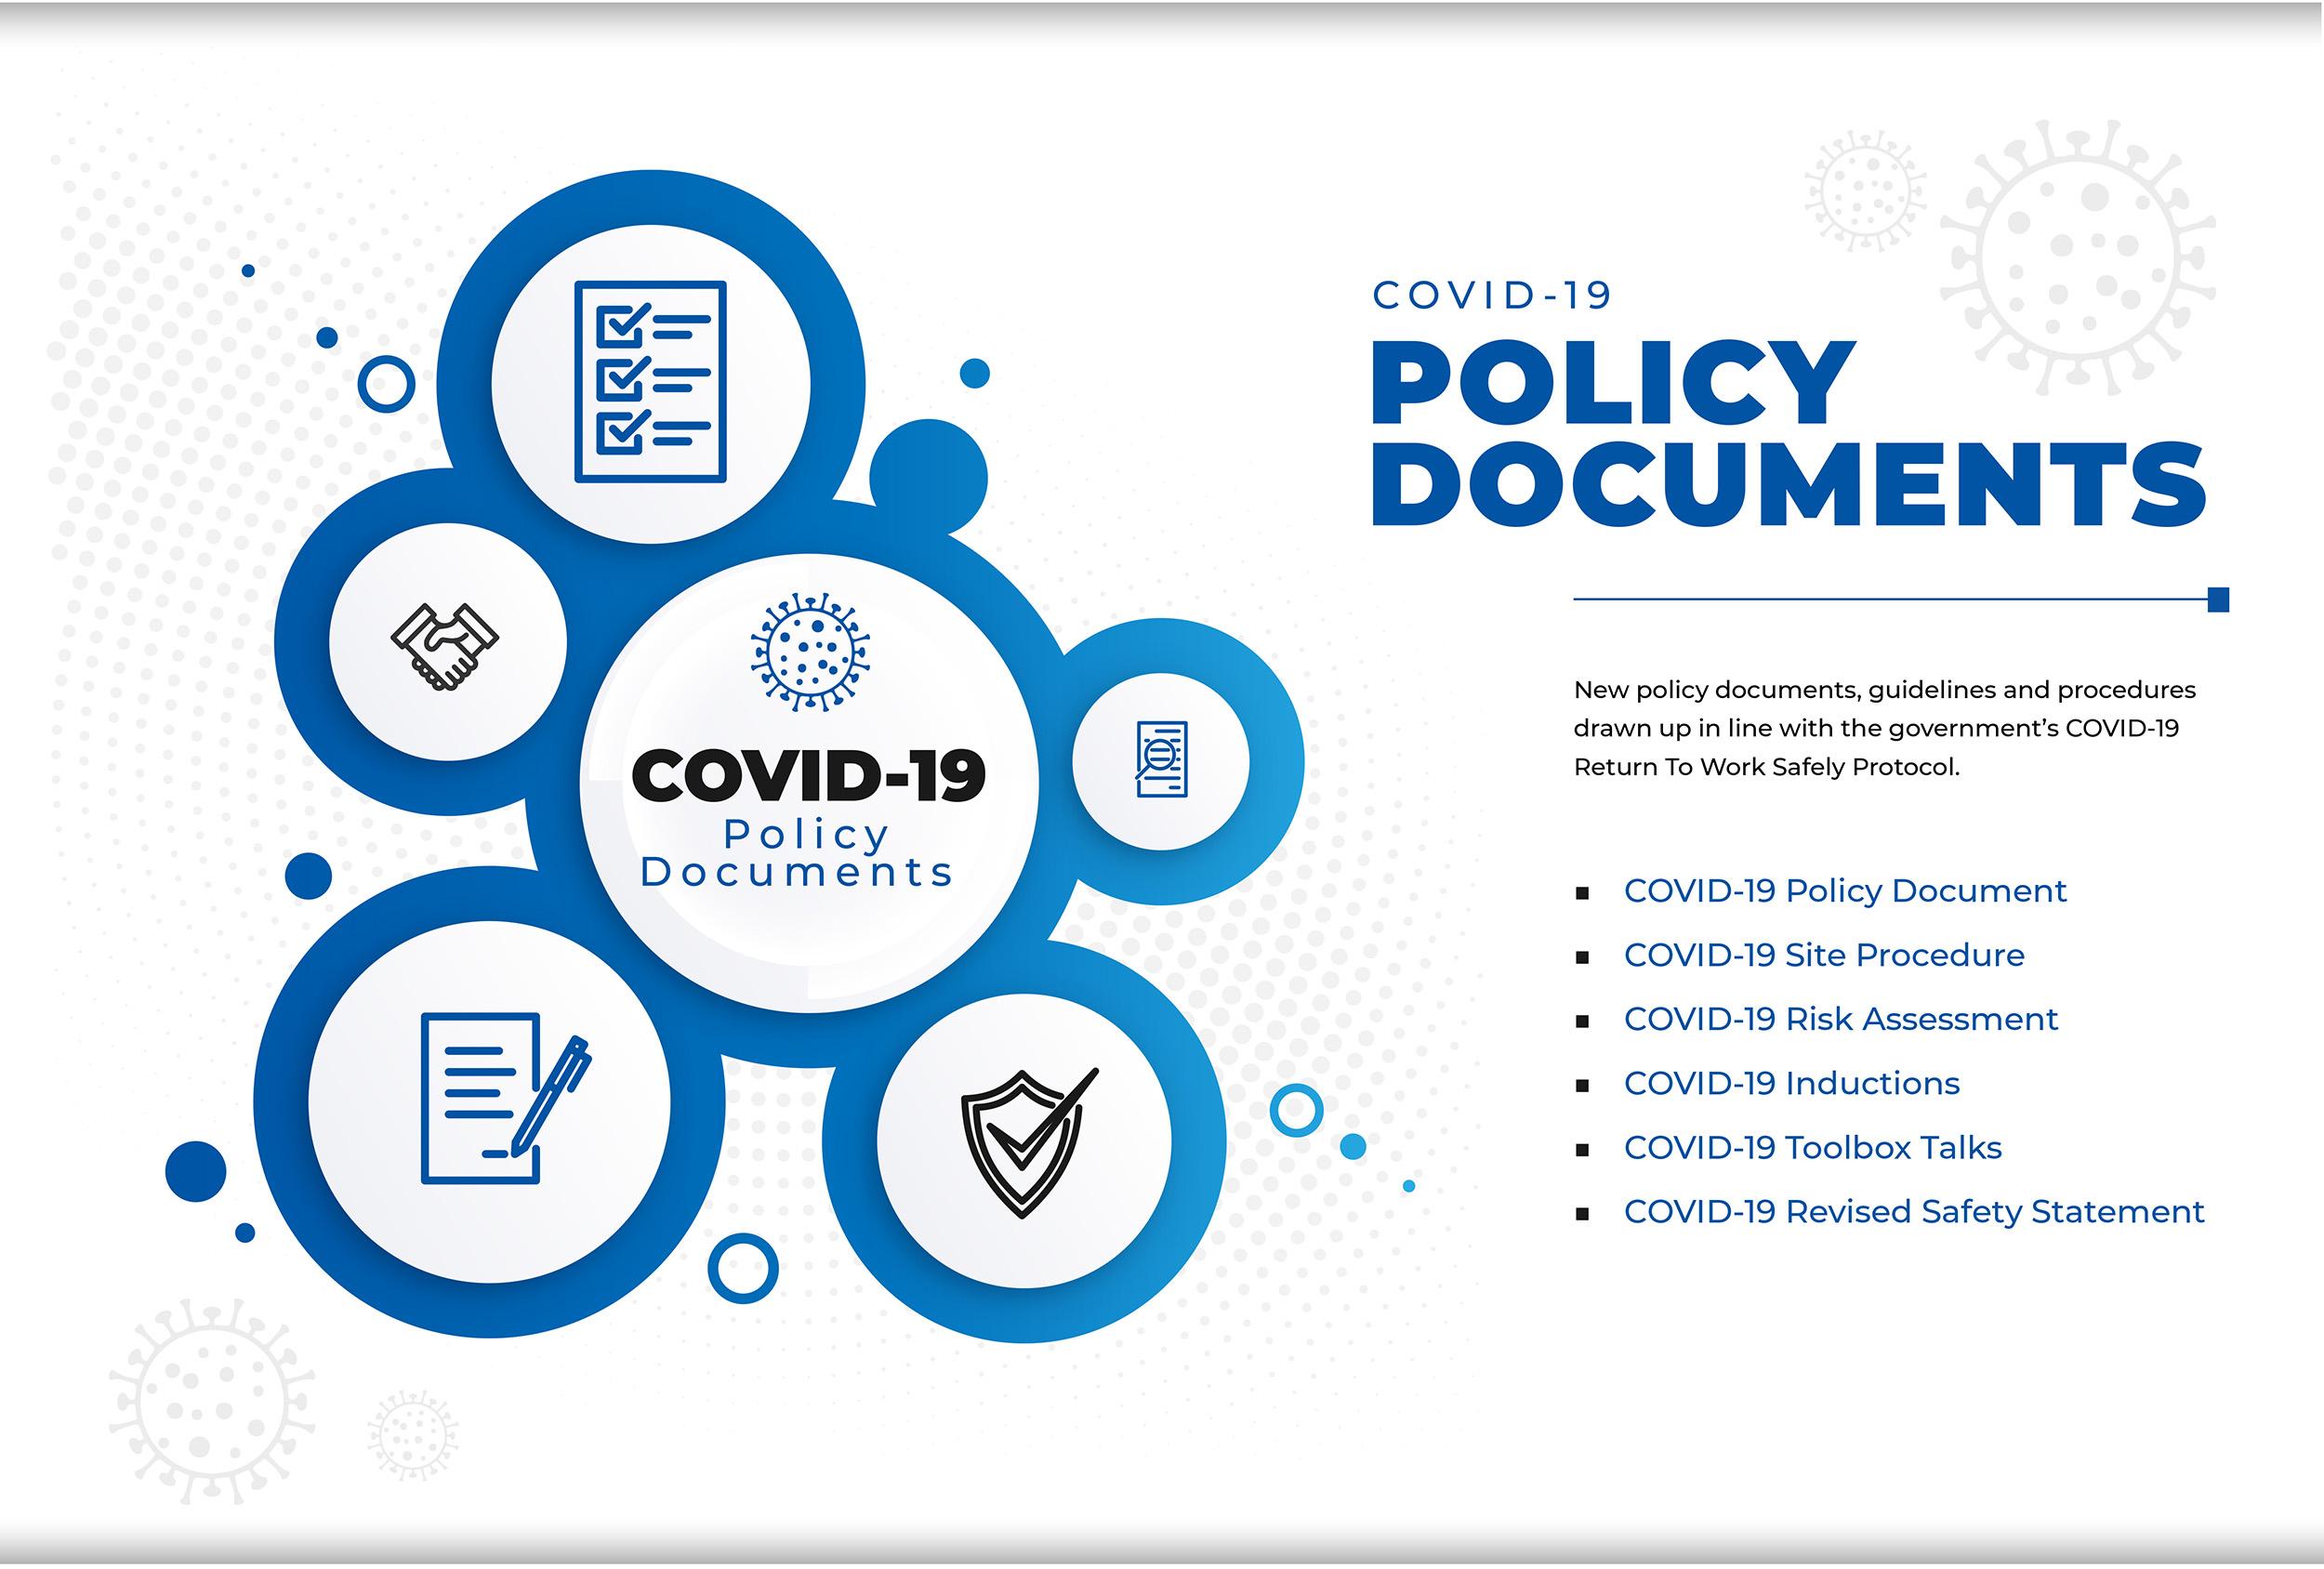 Williaam Cox covid-19 policy documents graphics